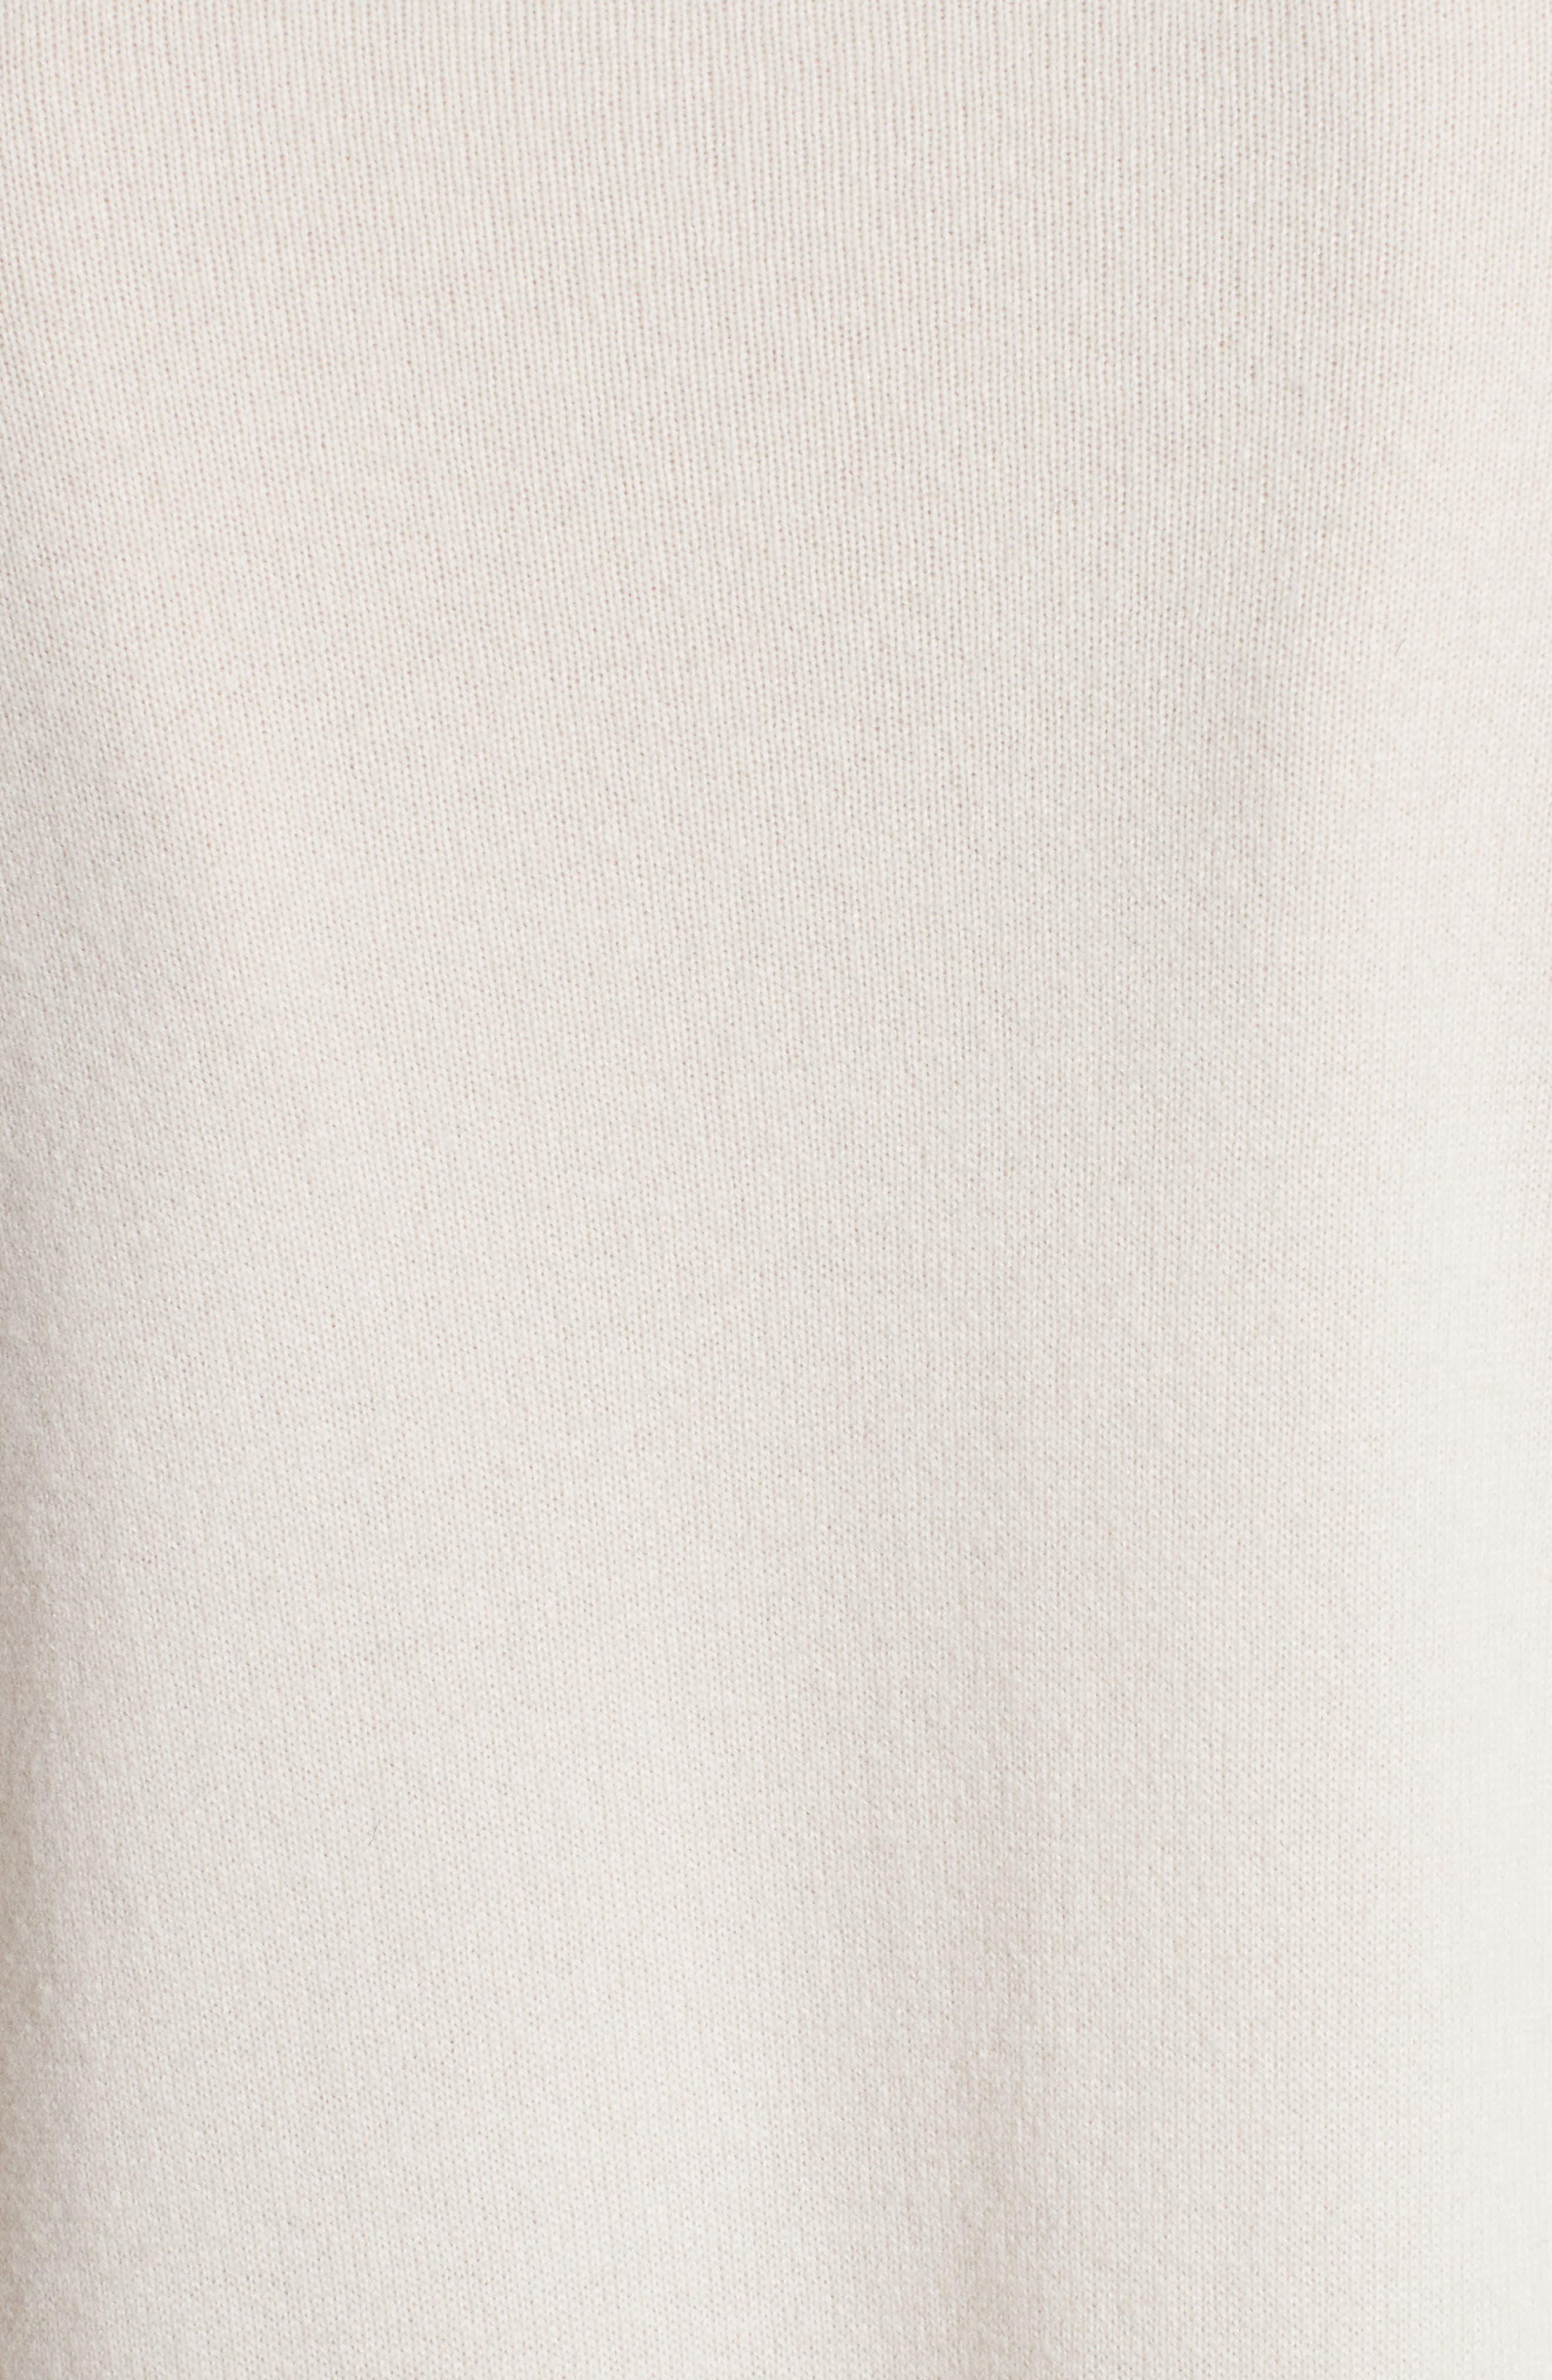 Alternate Image 3  - Fabiana Filippi Wool, Silk & Cashmere Knit Dress